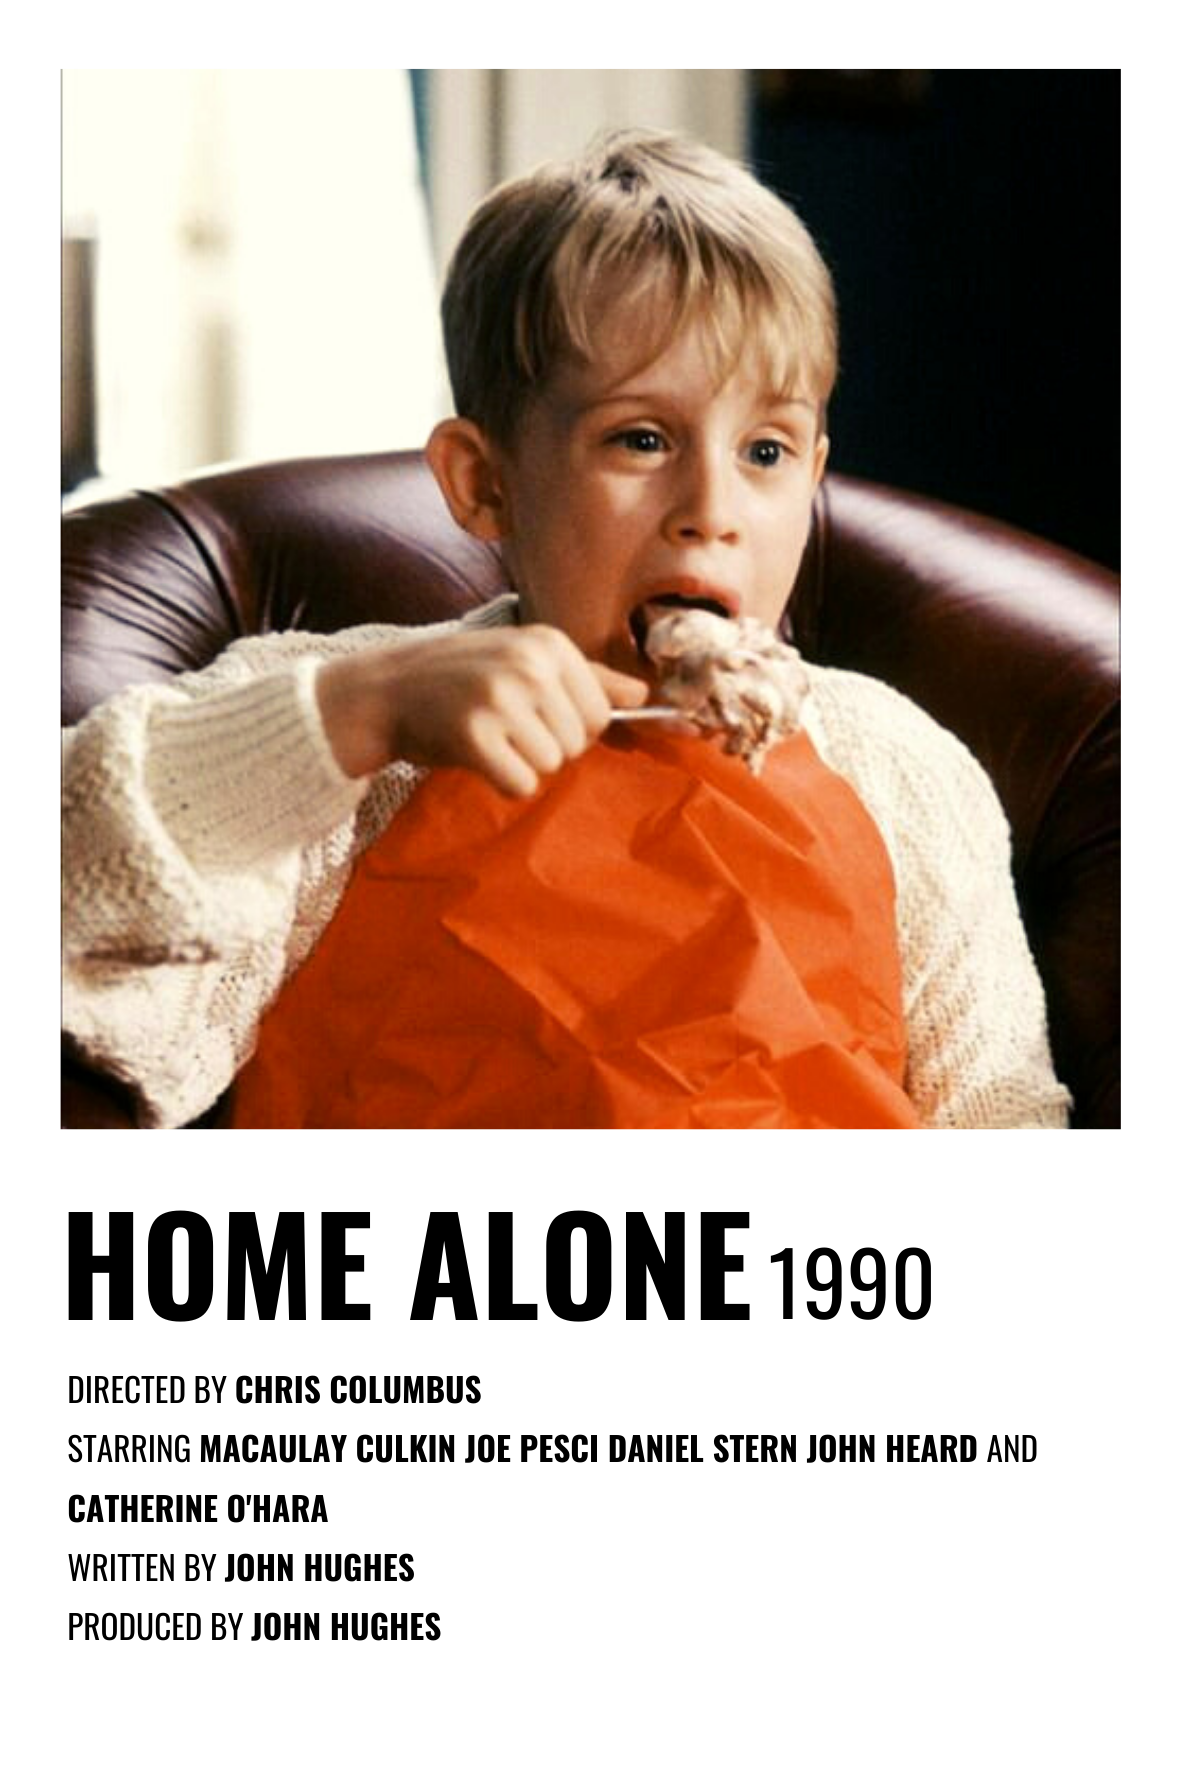 Minimalist Movie Posters Home Alone